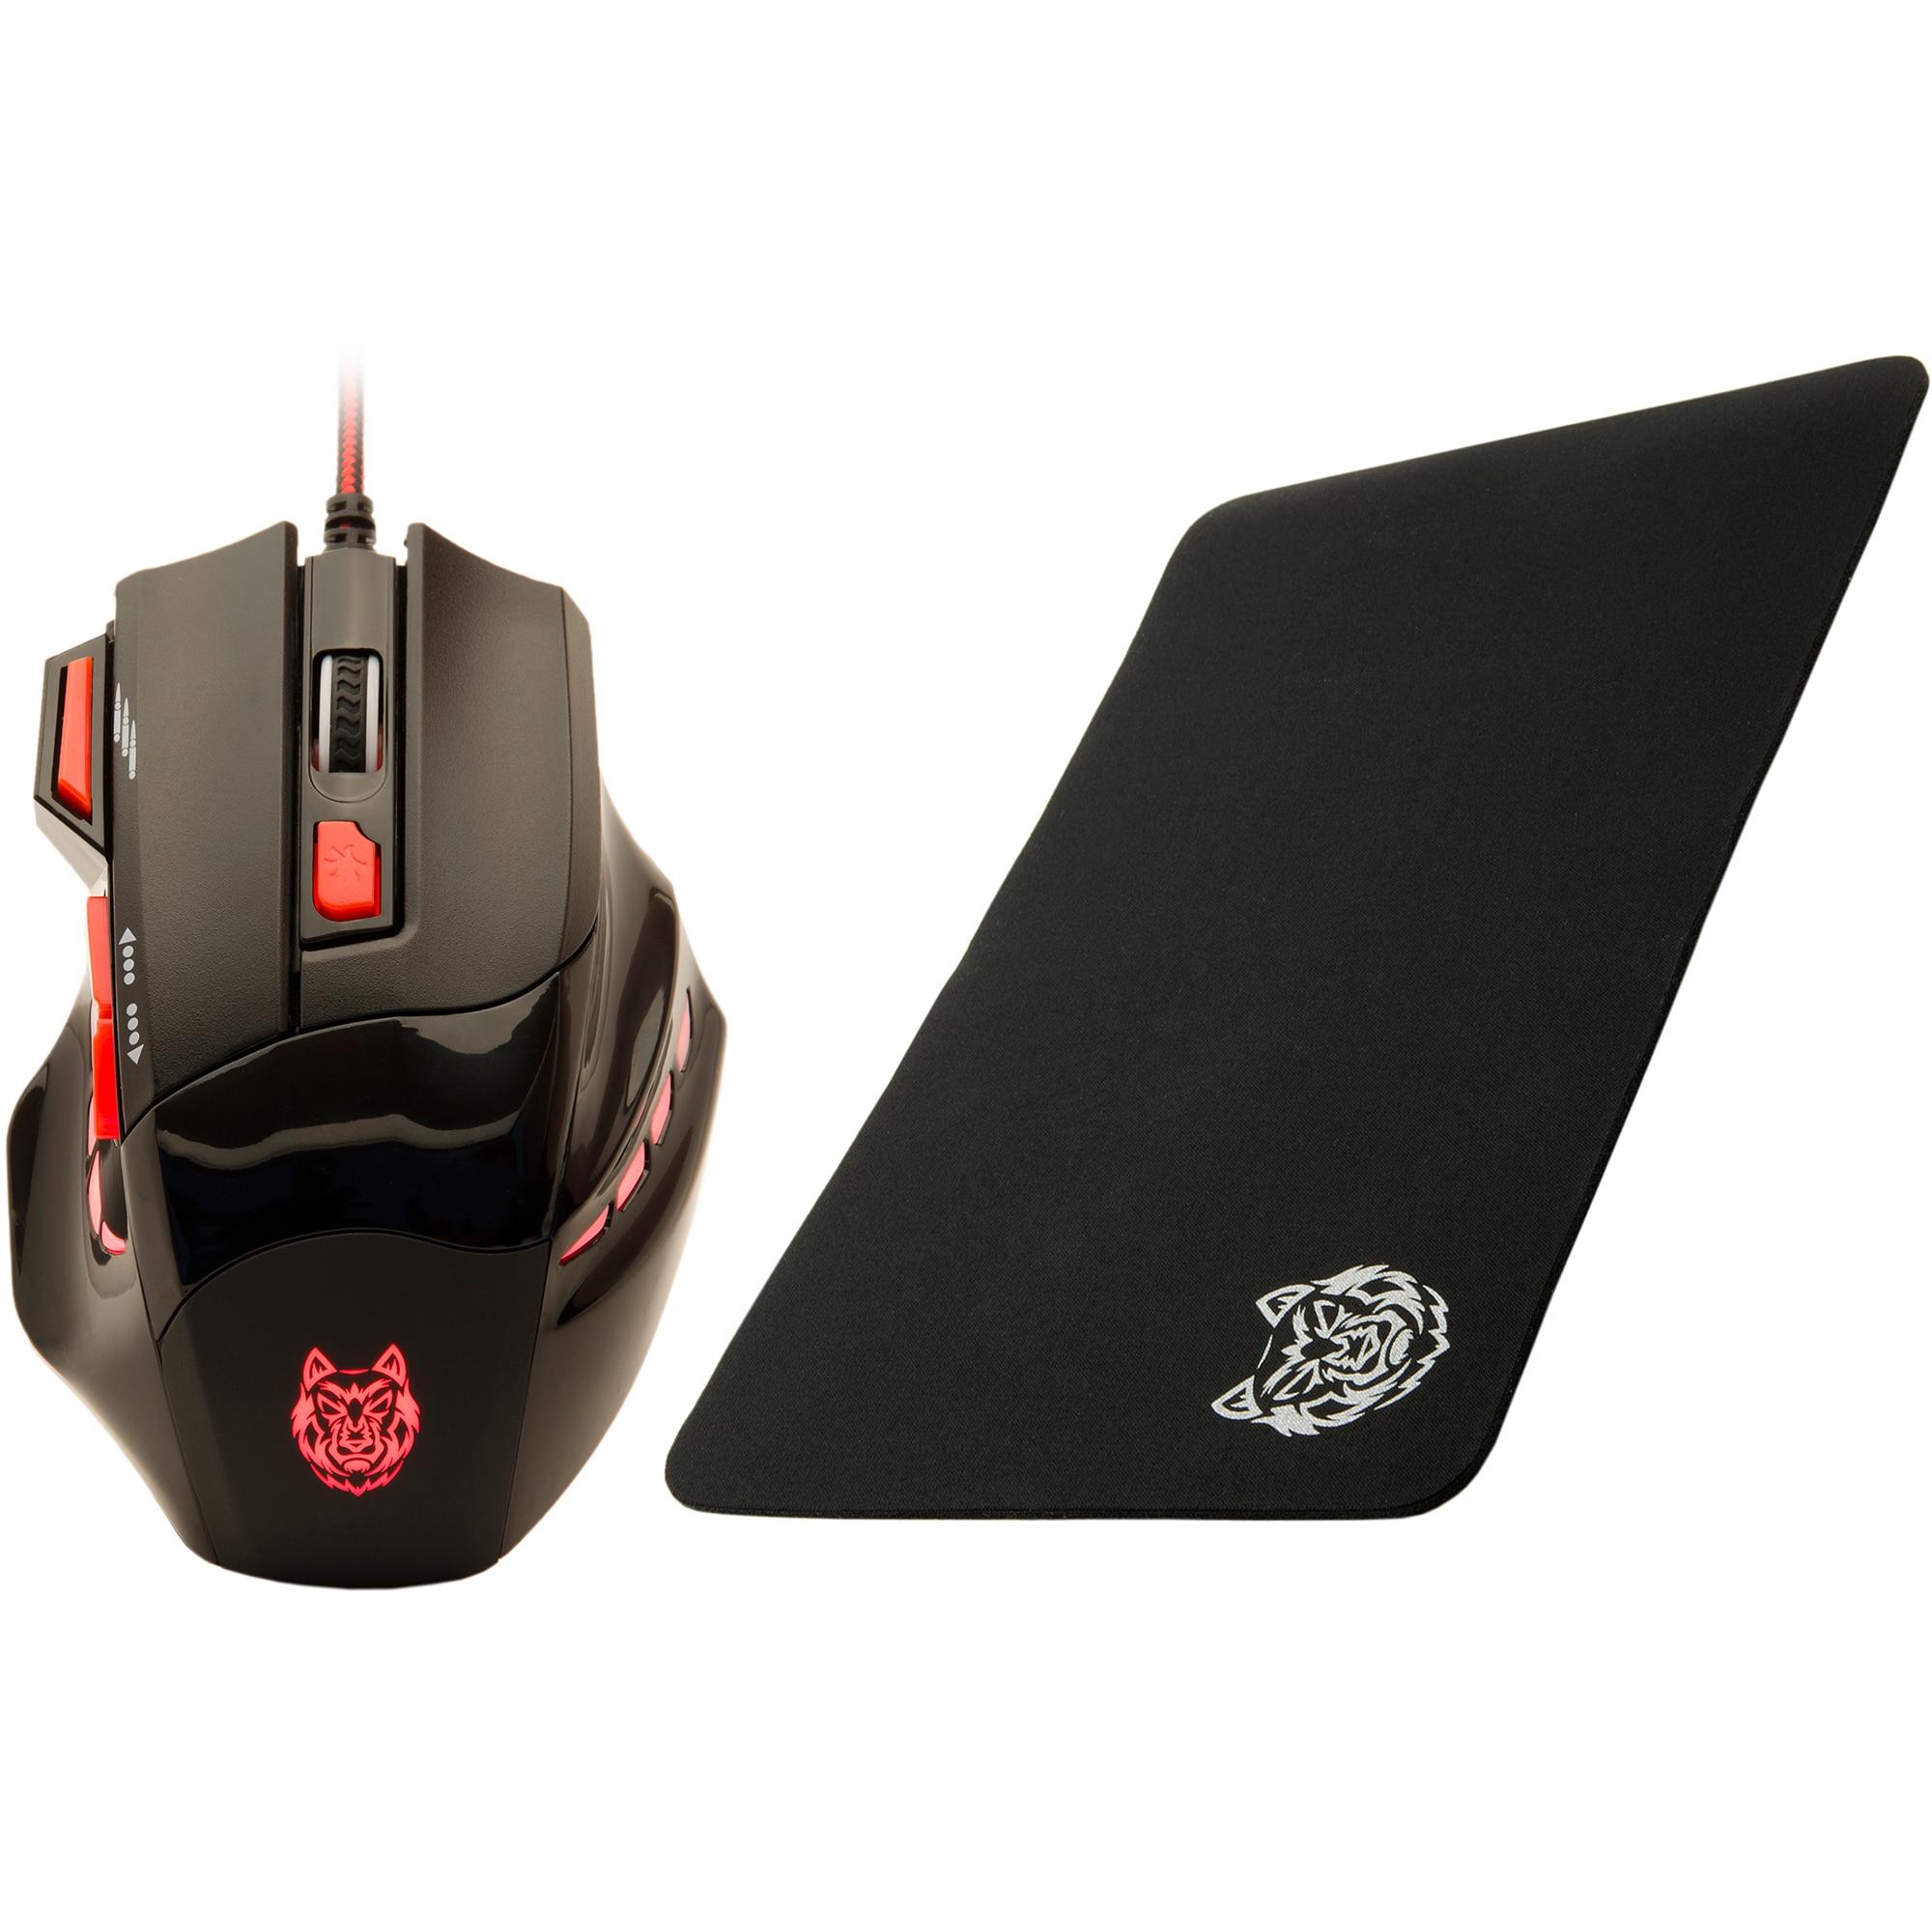 Fotografie Mouse gaming A+ KuaFu 2400 DPI + Mouse Pad A+, Negru